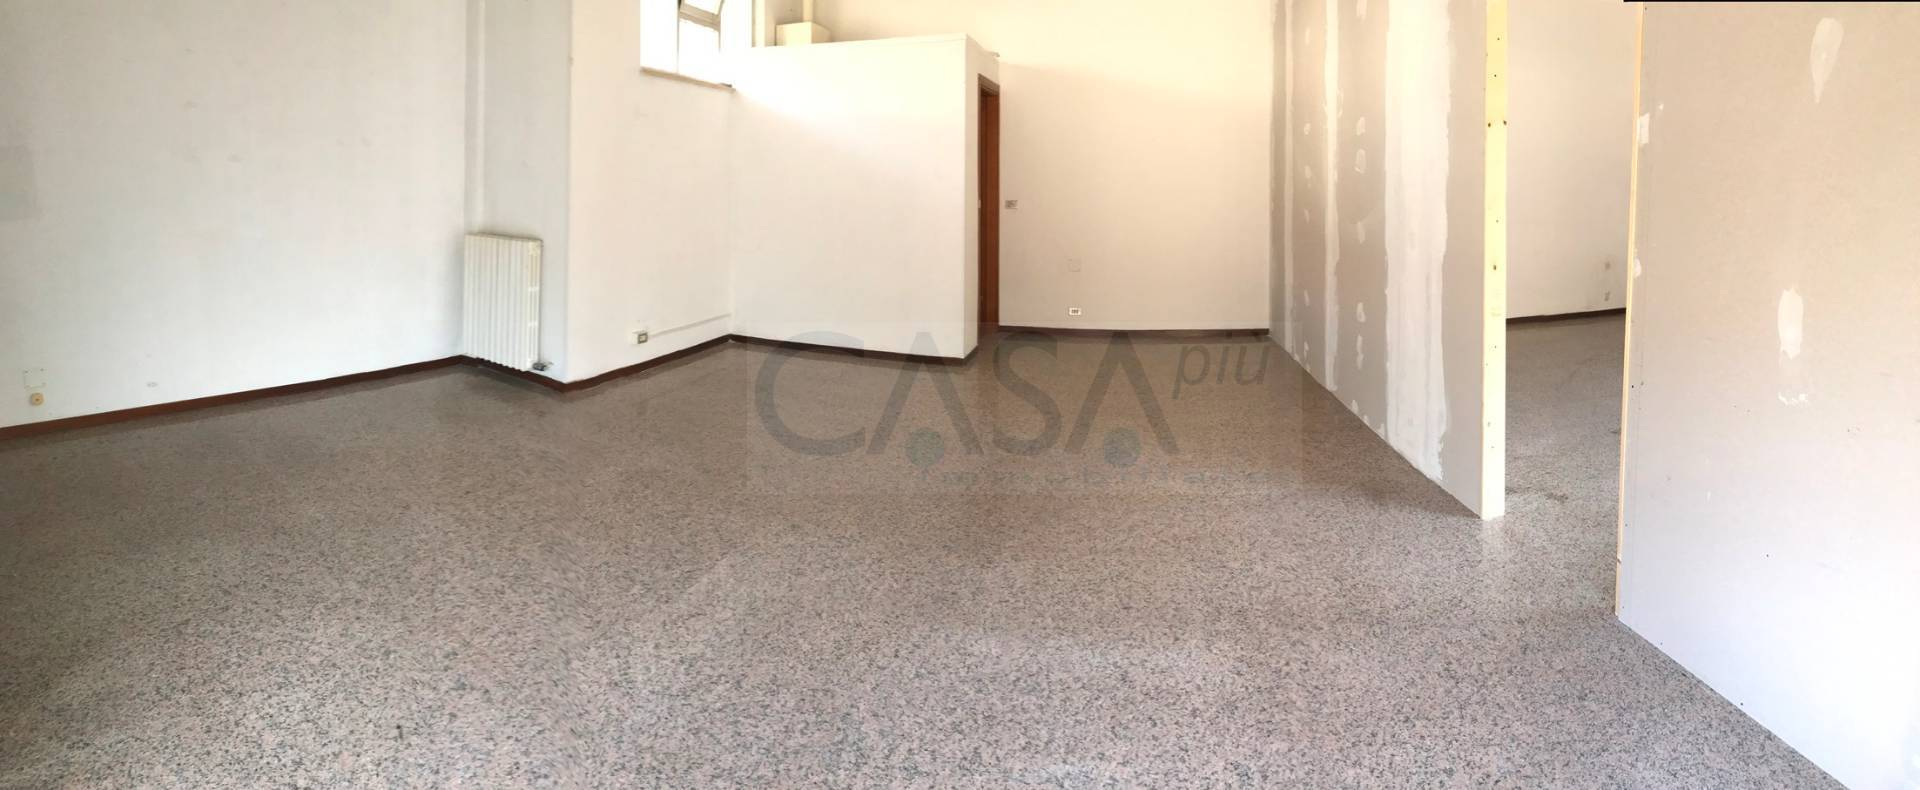 Ufficio in vendita a Martinsicuro Rif. 10174222